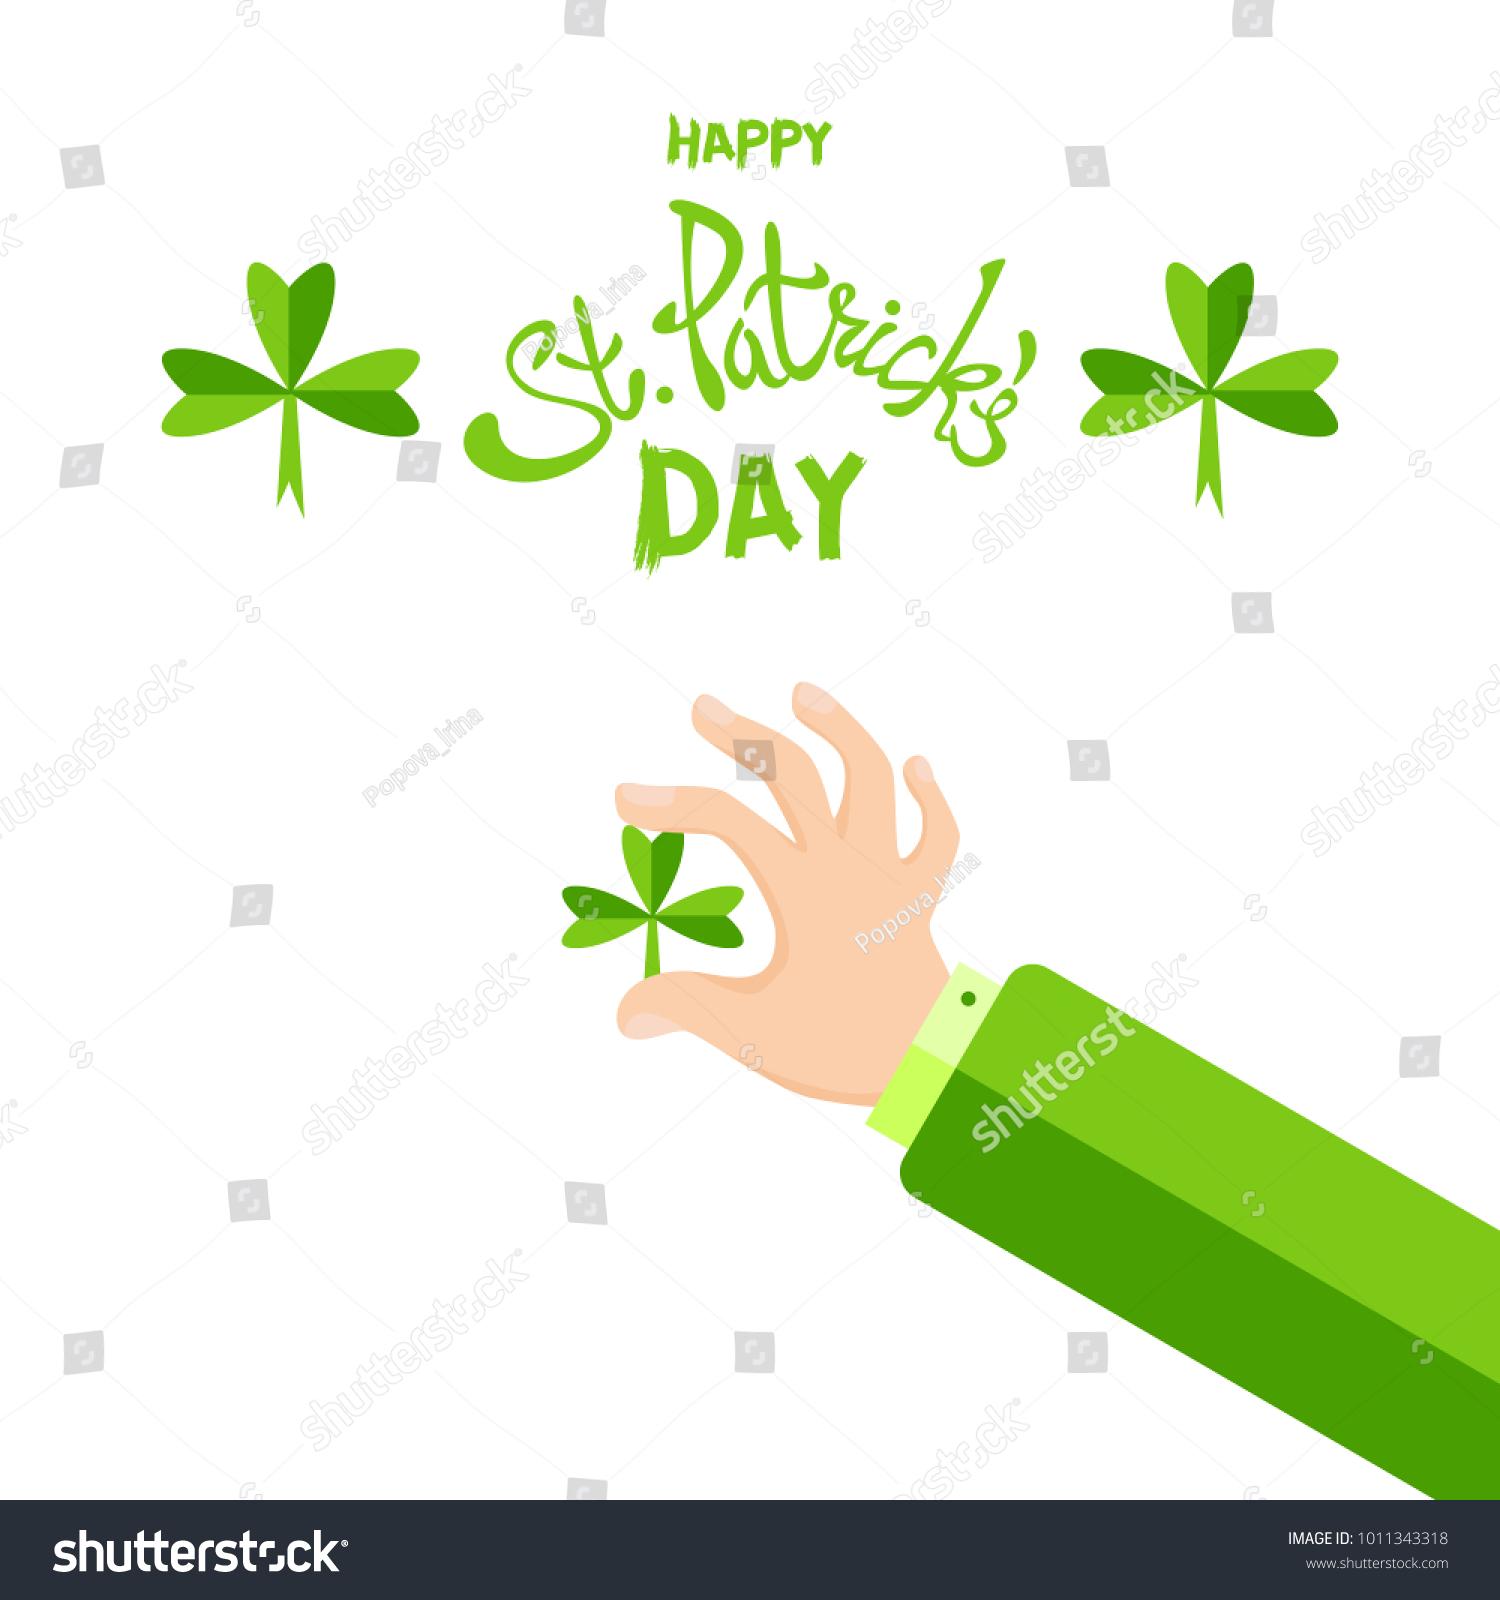 Happy St Patricks Day Card Words Stock Vector 1011343318 Shutterstock